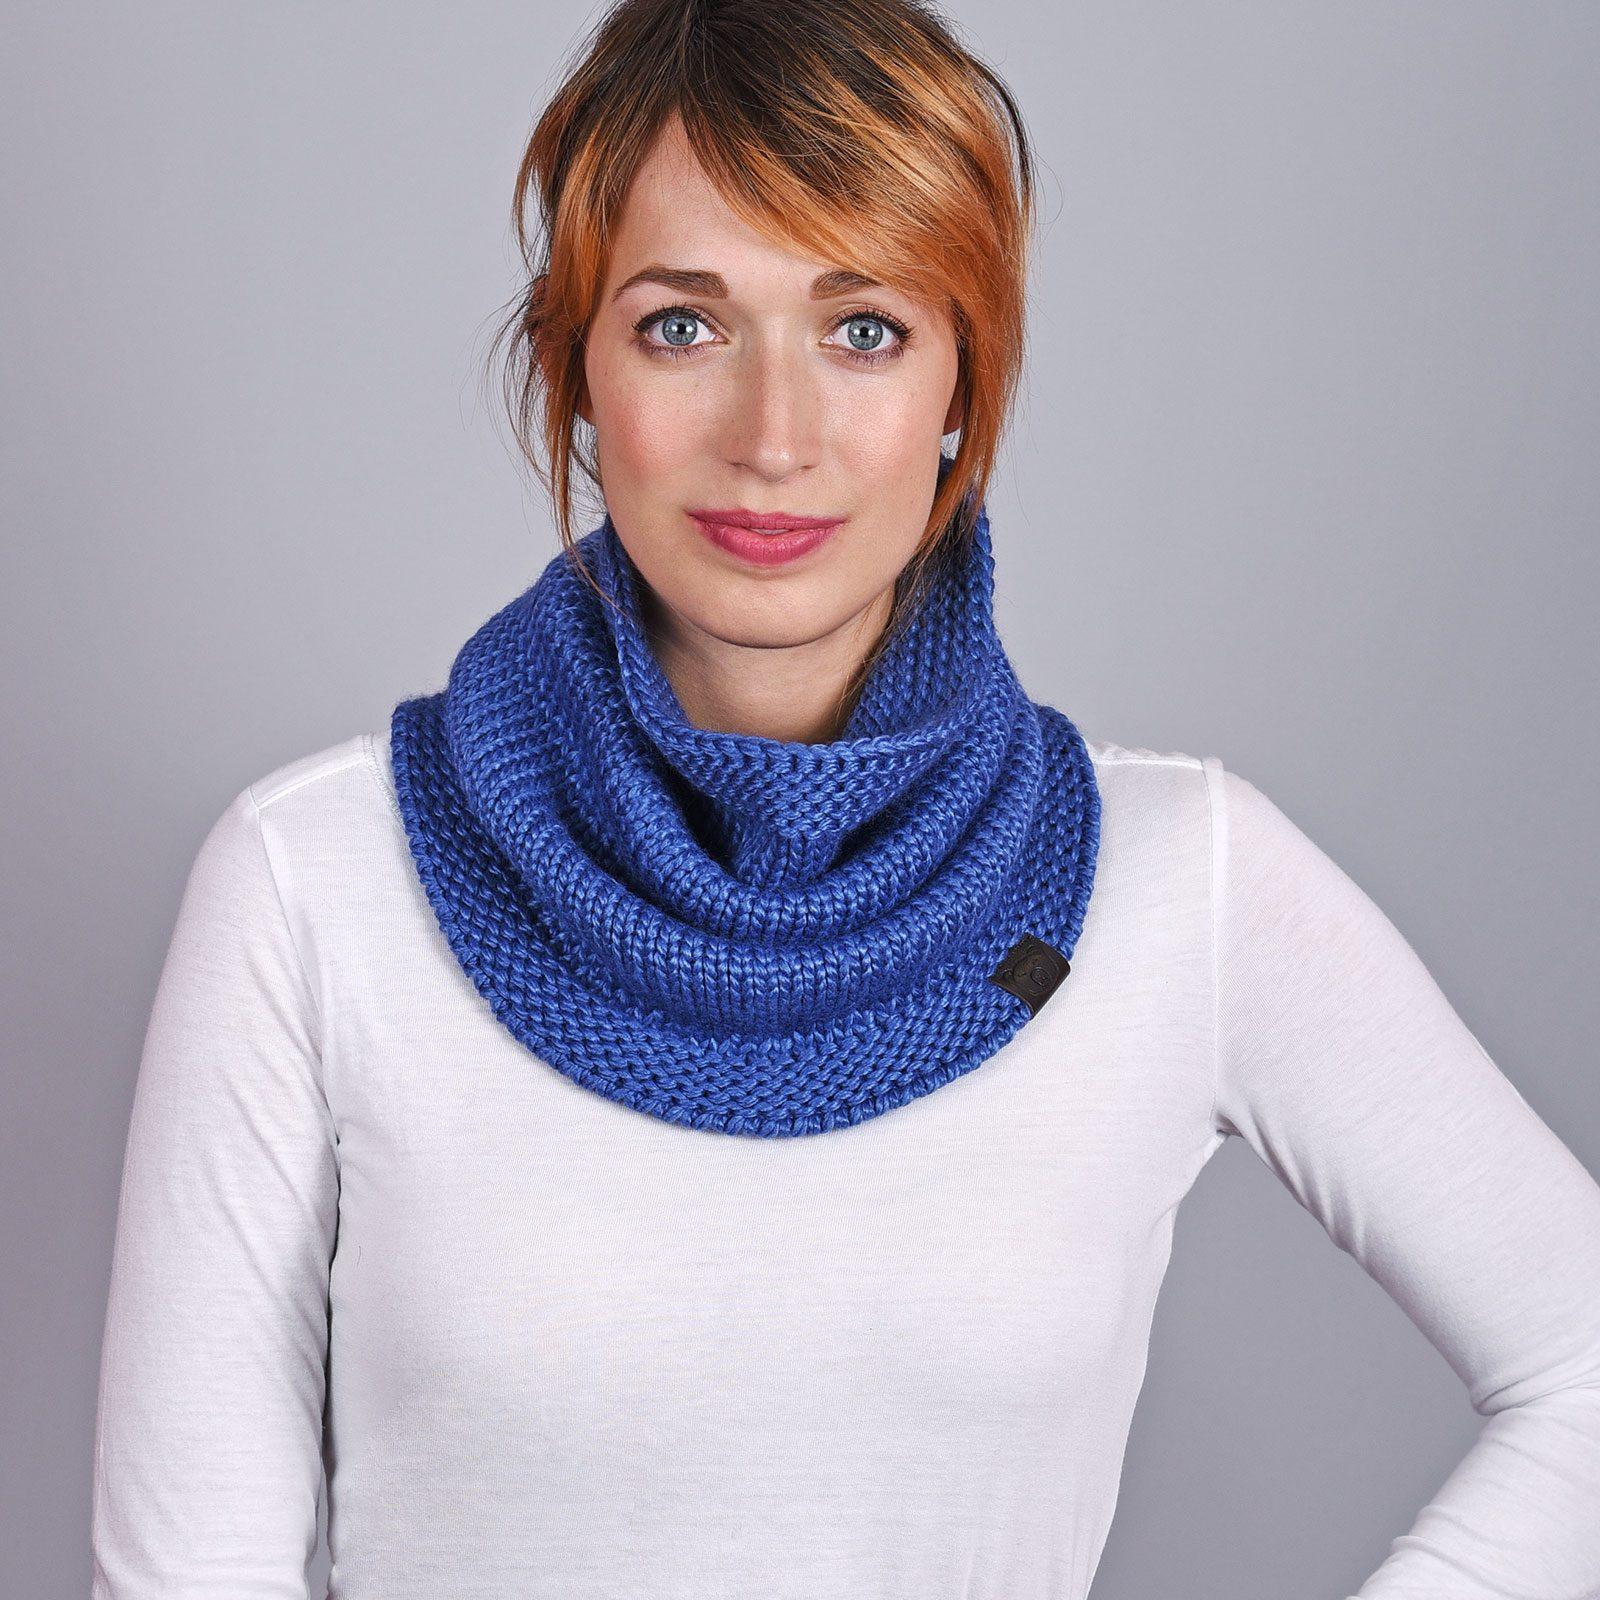 http://lookbook.allee-du-foulard.fr/wp-content/uploads/2018/12/AT-04570-VF16-1-echarpe-snood-bleue-1600x1600.jpg